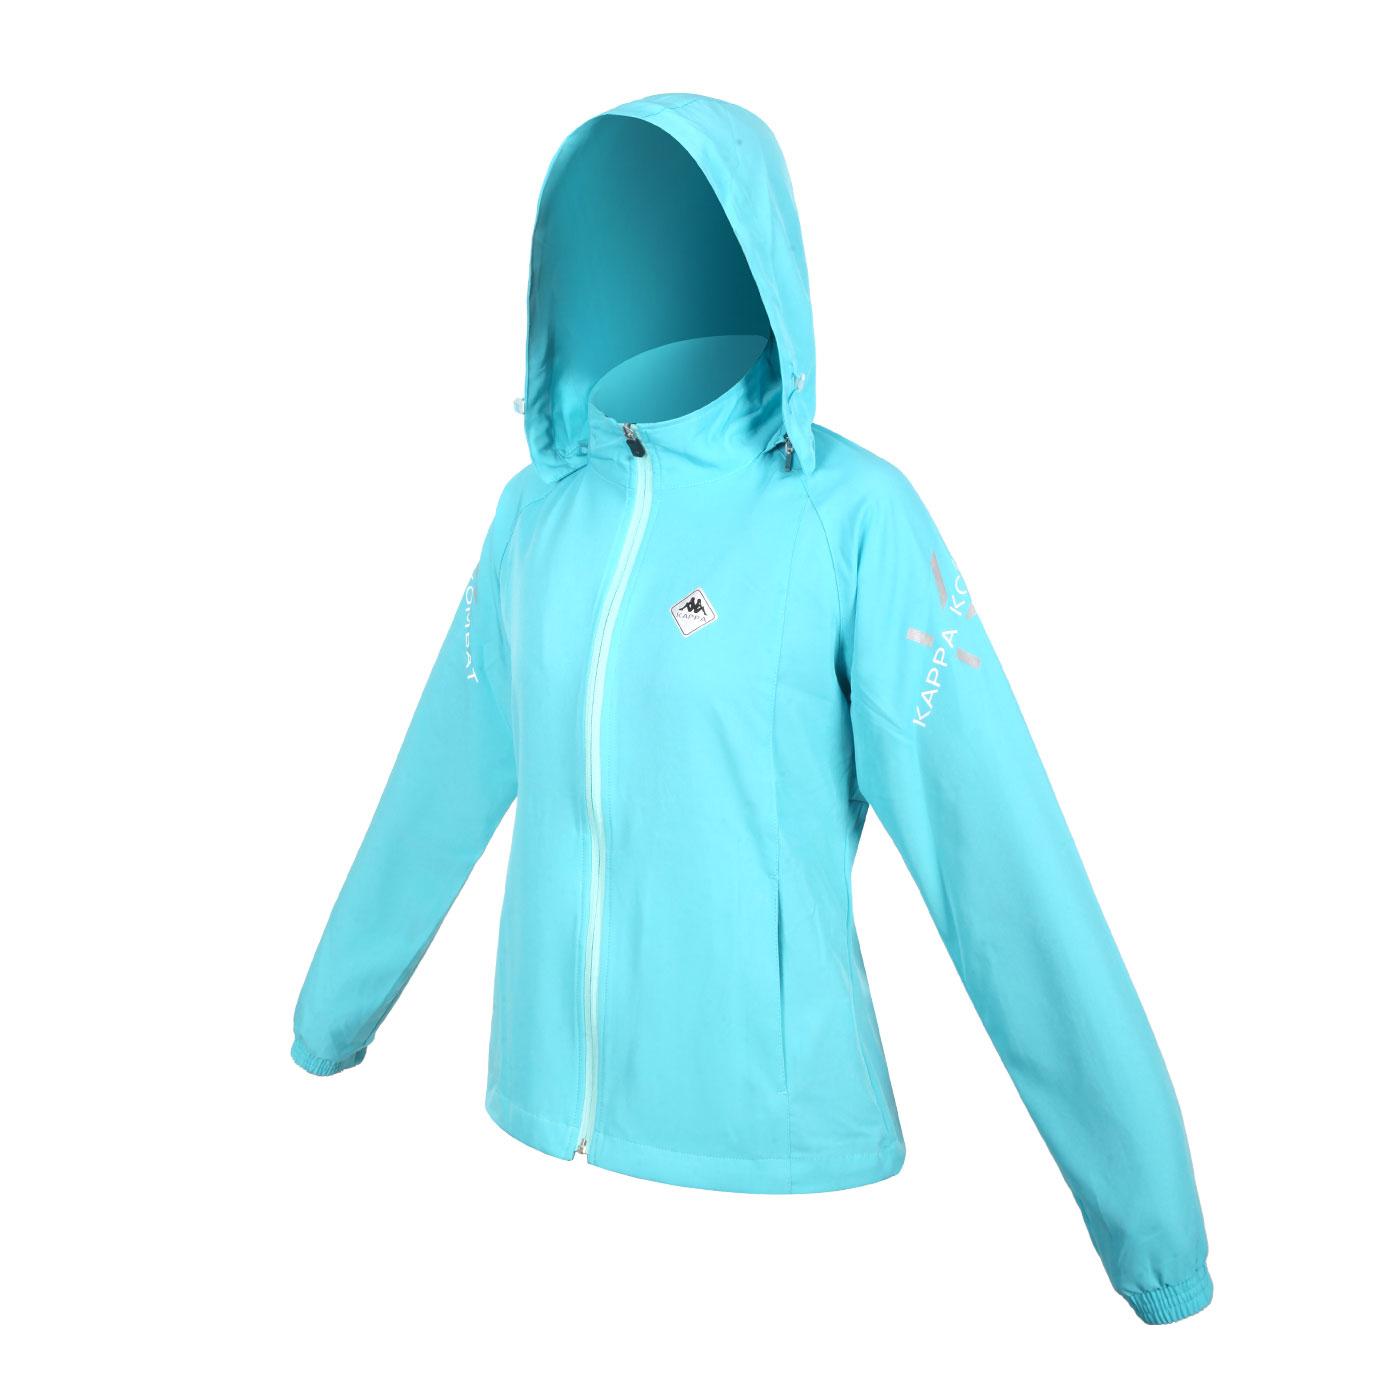 KAPPA 女款K4T單層風衣 37168PW-474 - 湖水藍綠